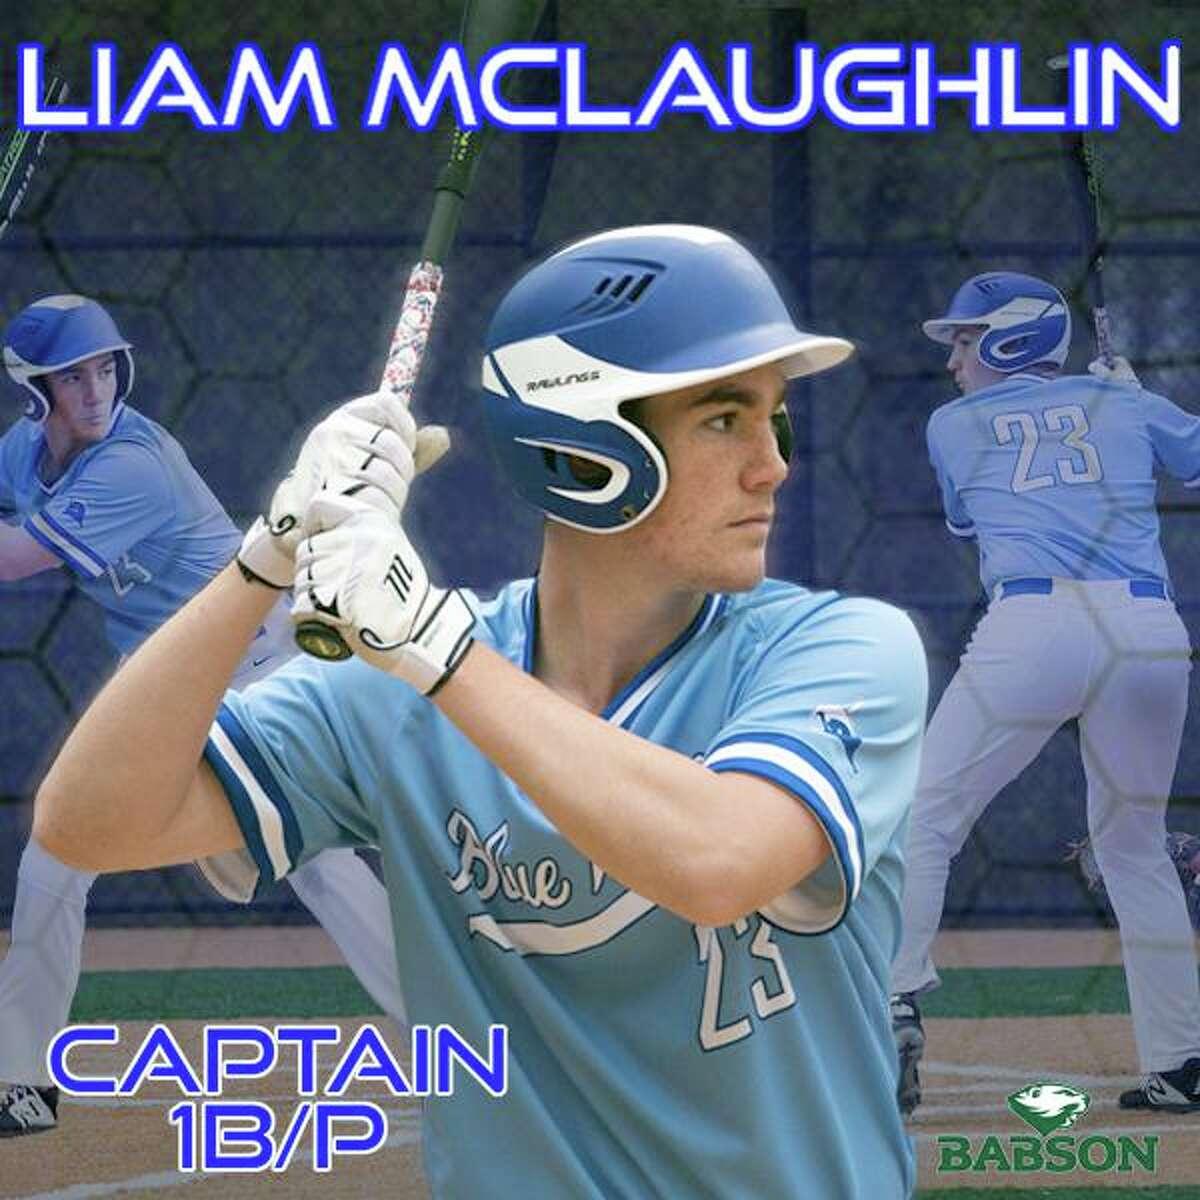 Liam McLaughlin